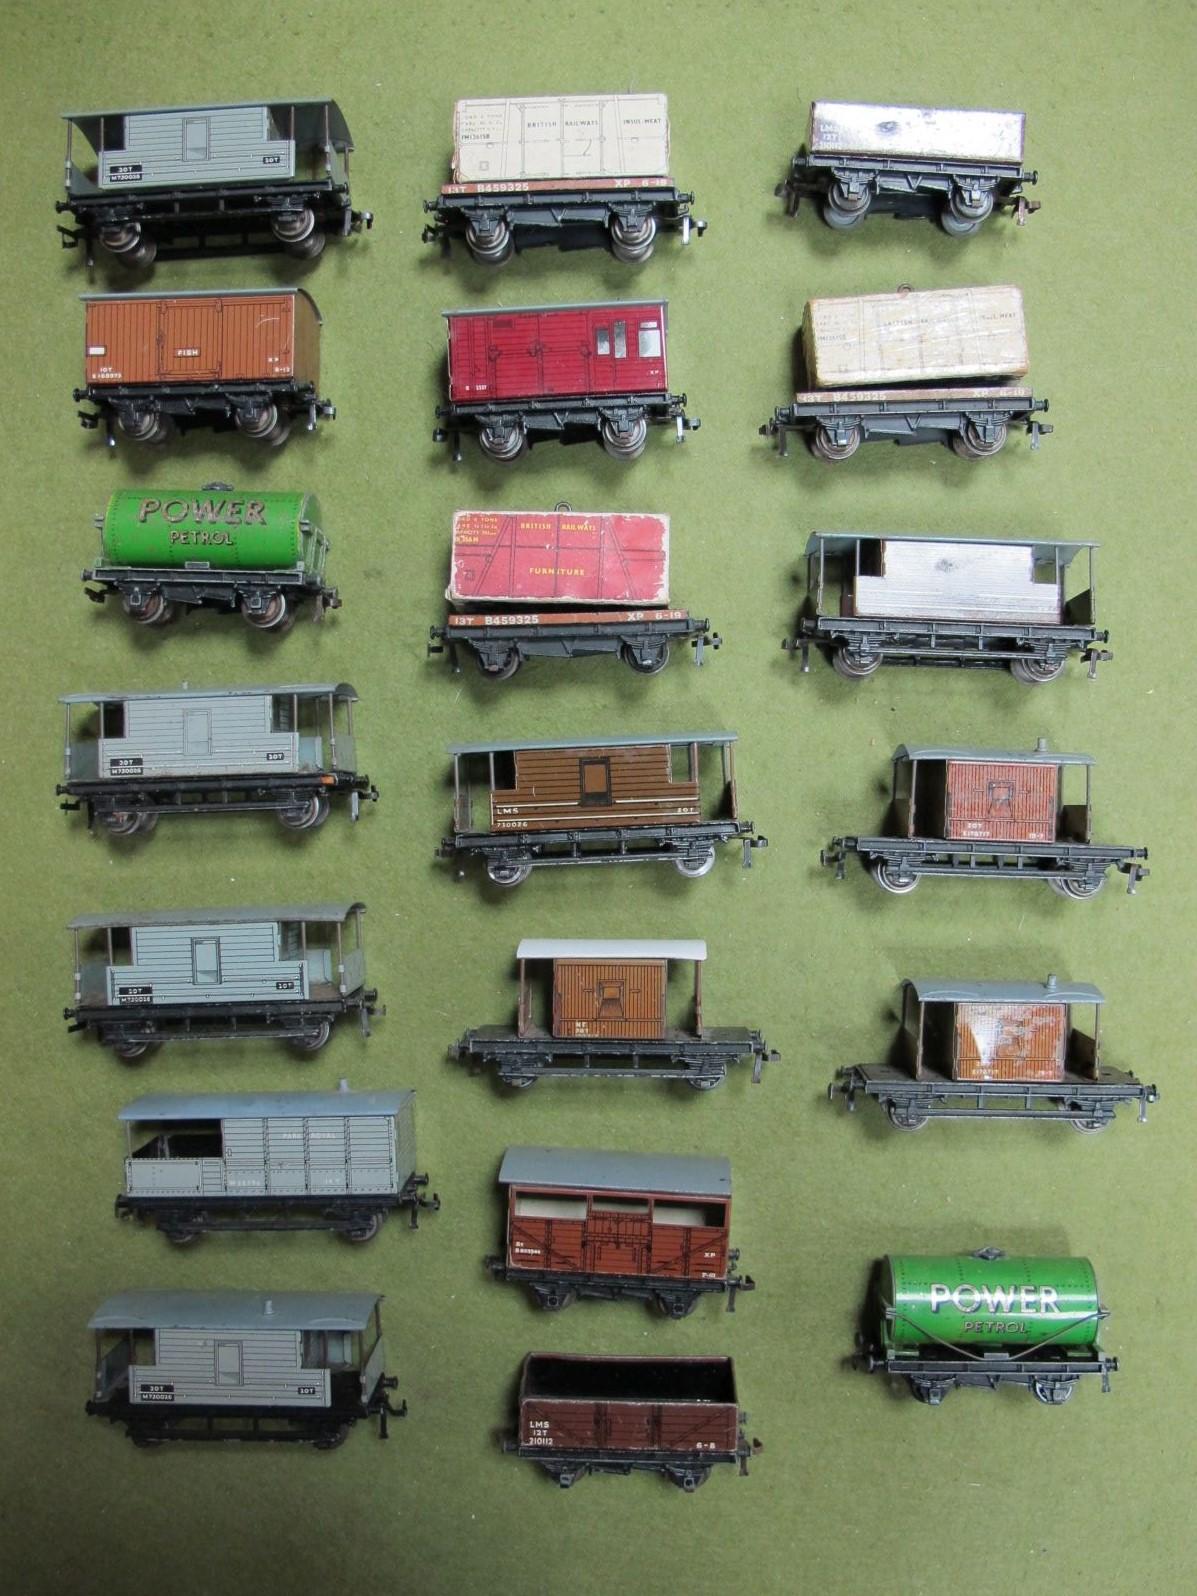 Lot 19 - An Assortment of Twenty Hornby Dublo Three Rail Wagons, all playworn.